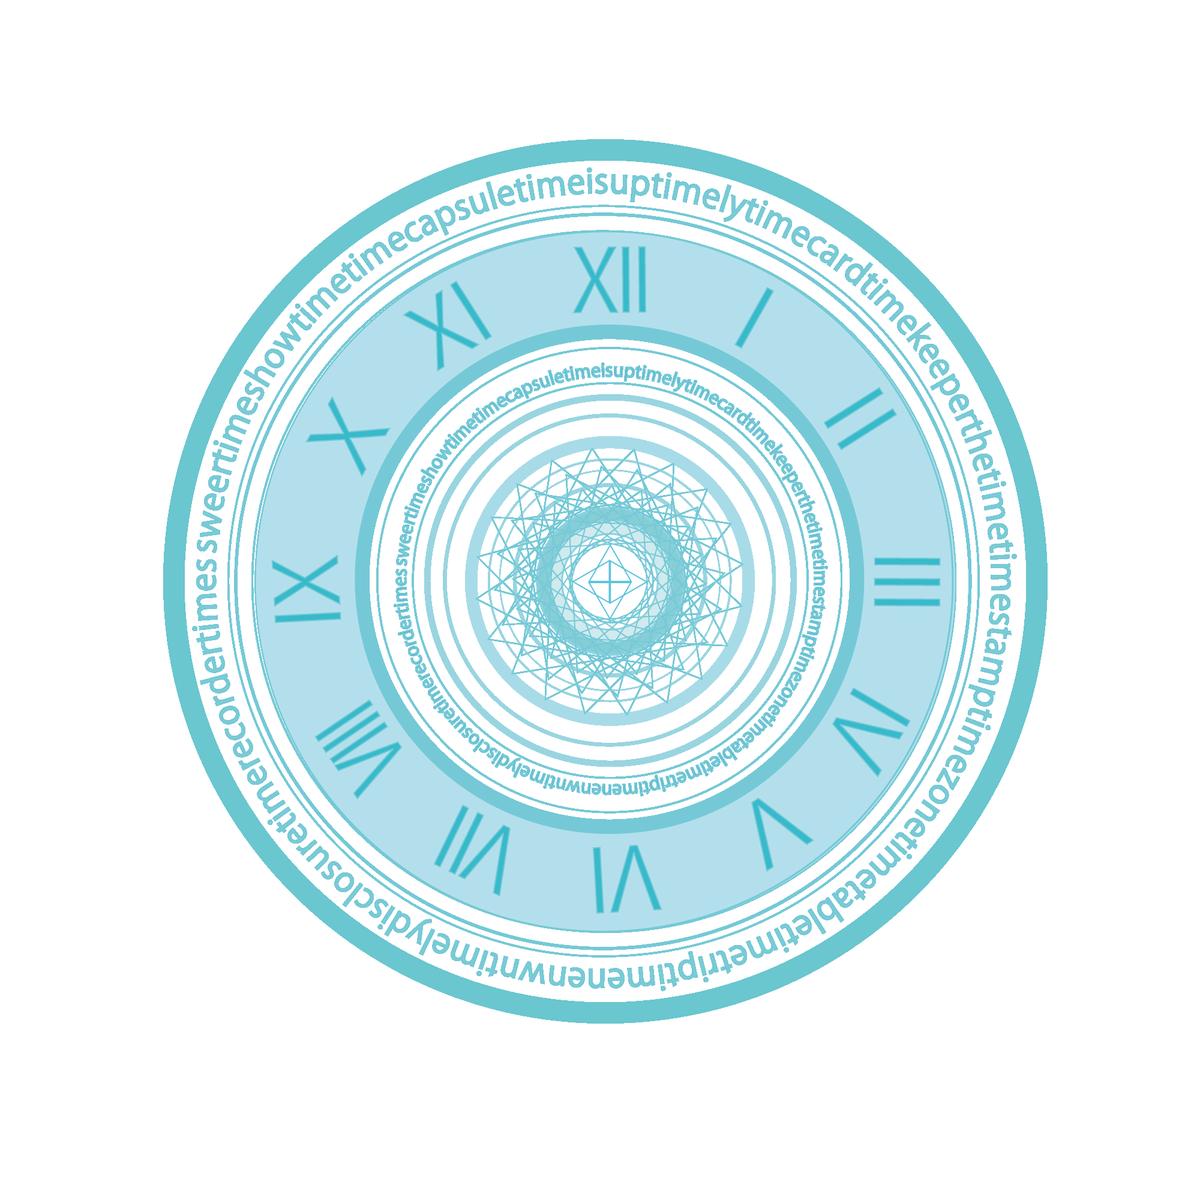 Mike Clearpalette 日曜日イラスト投稿 A Twitter 定期 拡散希望 絵 イラストデザイン スタンプ作成 ロゴ作成 素材等のお仕事承ります Dmにてお気軽にご相談ください 創作の狼煙 絵描きの輪 デザイン 時計 魔法陣 ロゴ 素材 T Co